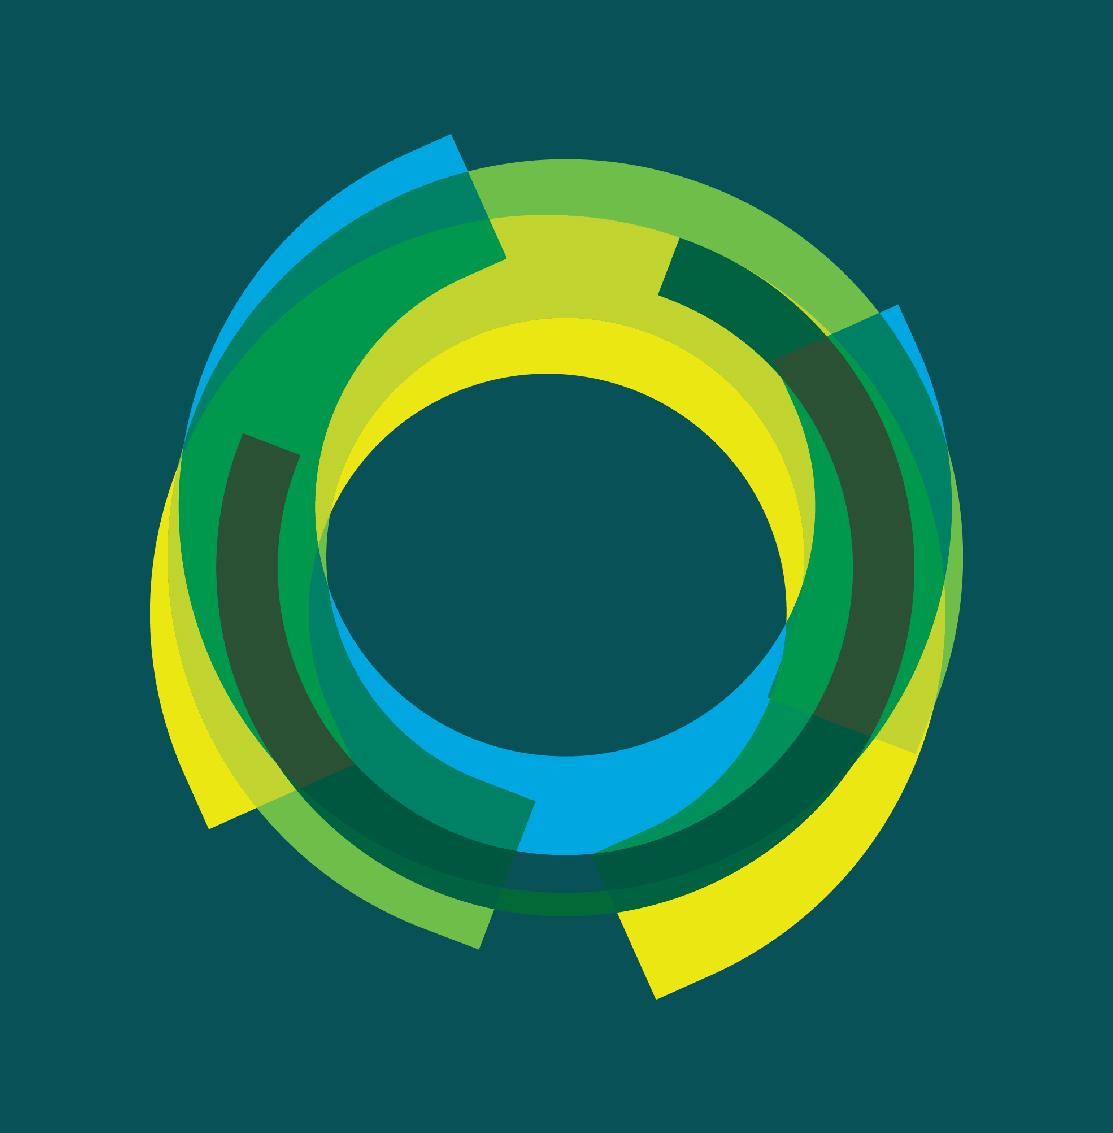 harris-interactive-logo-news